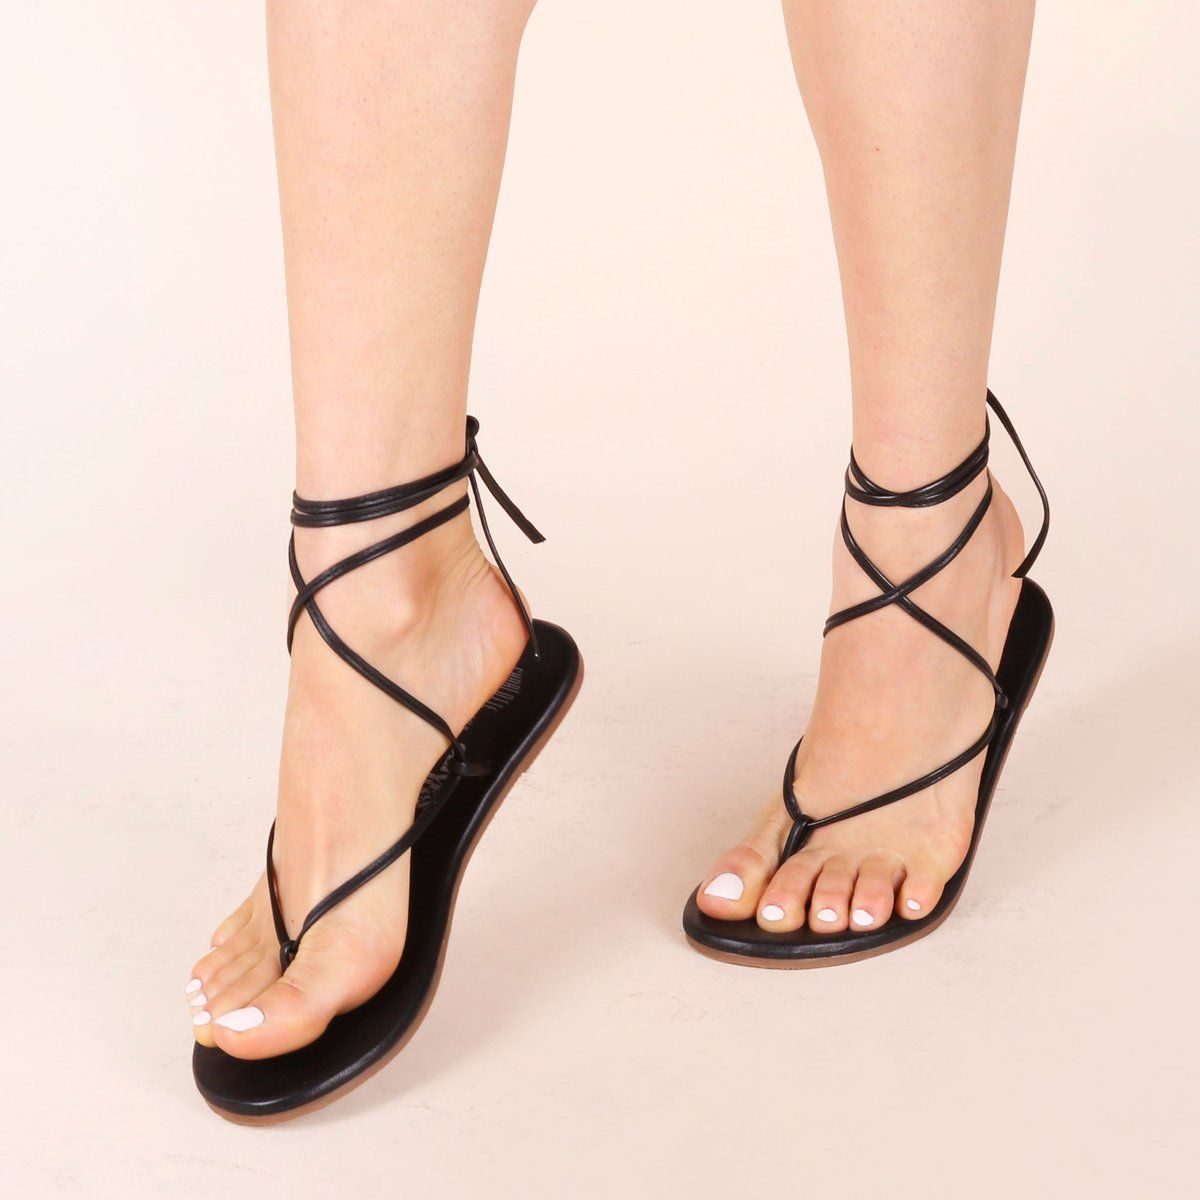 1a24fc400688 SUNSHINE Leather sandals  unisex sandals  strappy sandals